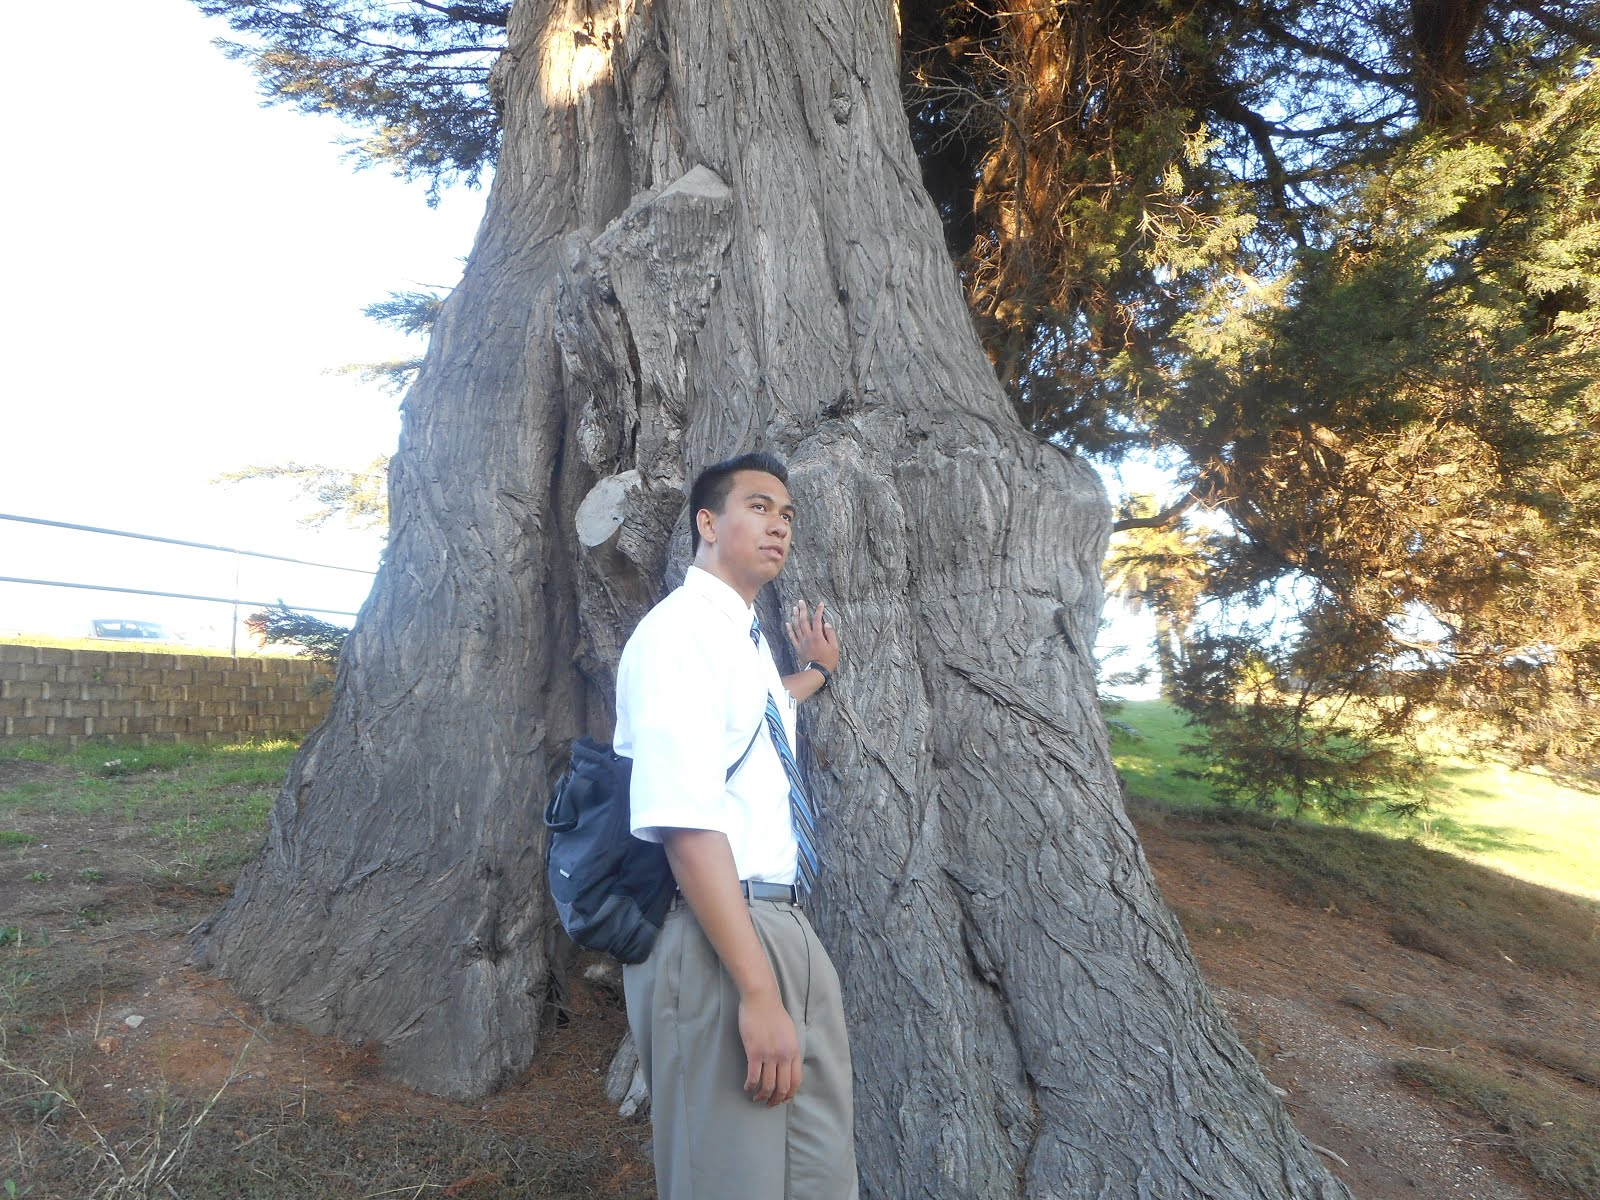 Elder Kaanapu